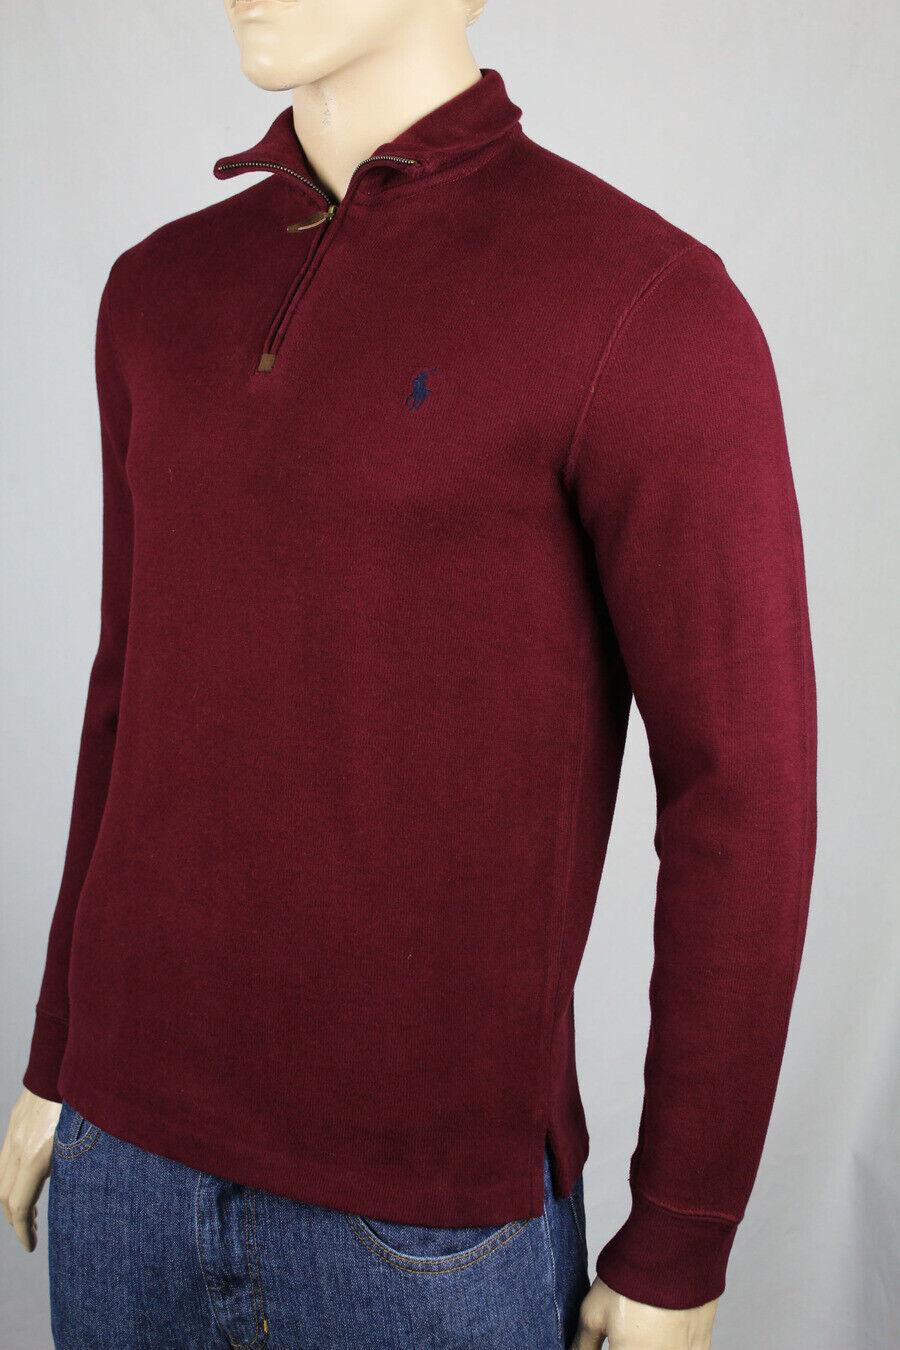 Polo Ralph Lauren Burgundy 1 2 Half Zip Sweater Navy bluee Pony NWT